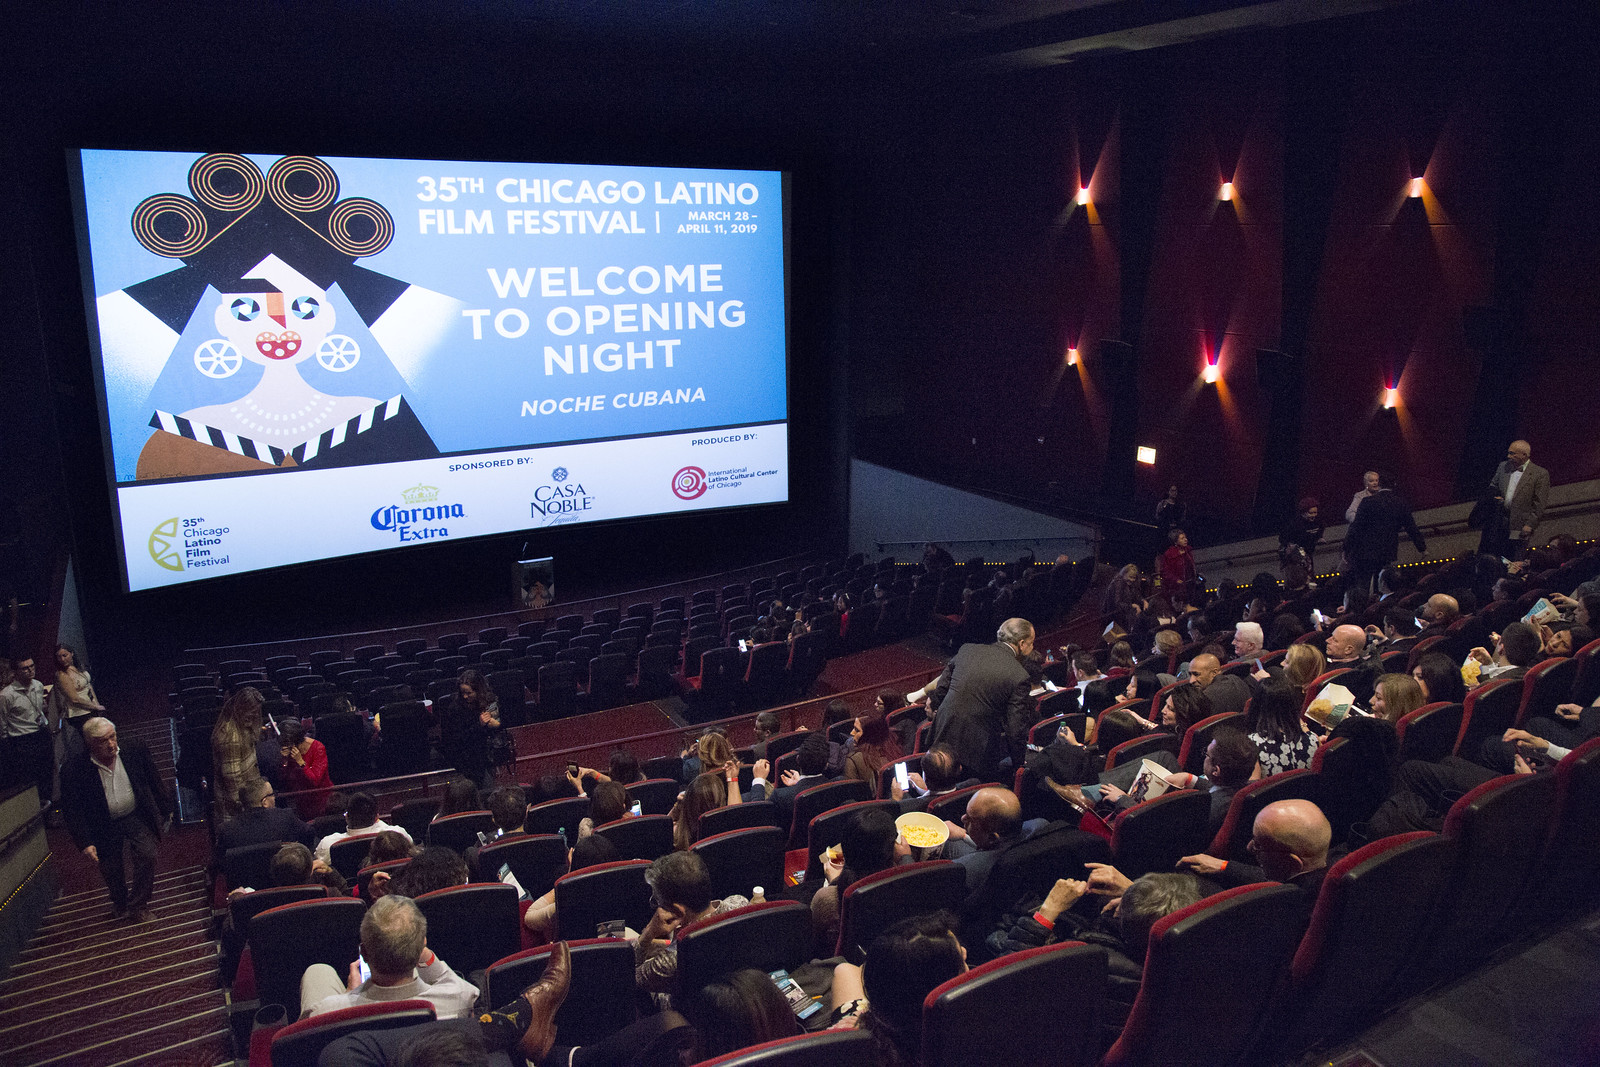 35th CLFF - Opening Night: Noche Cubana